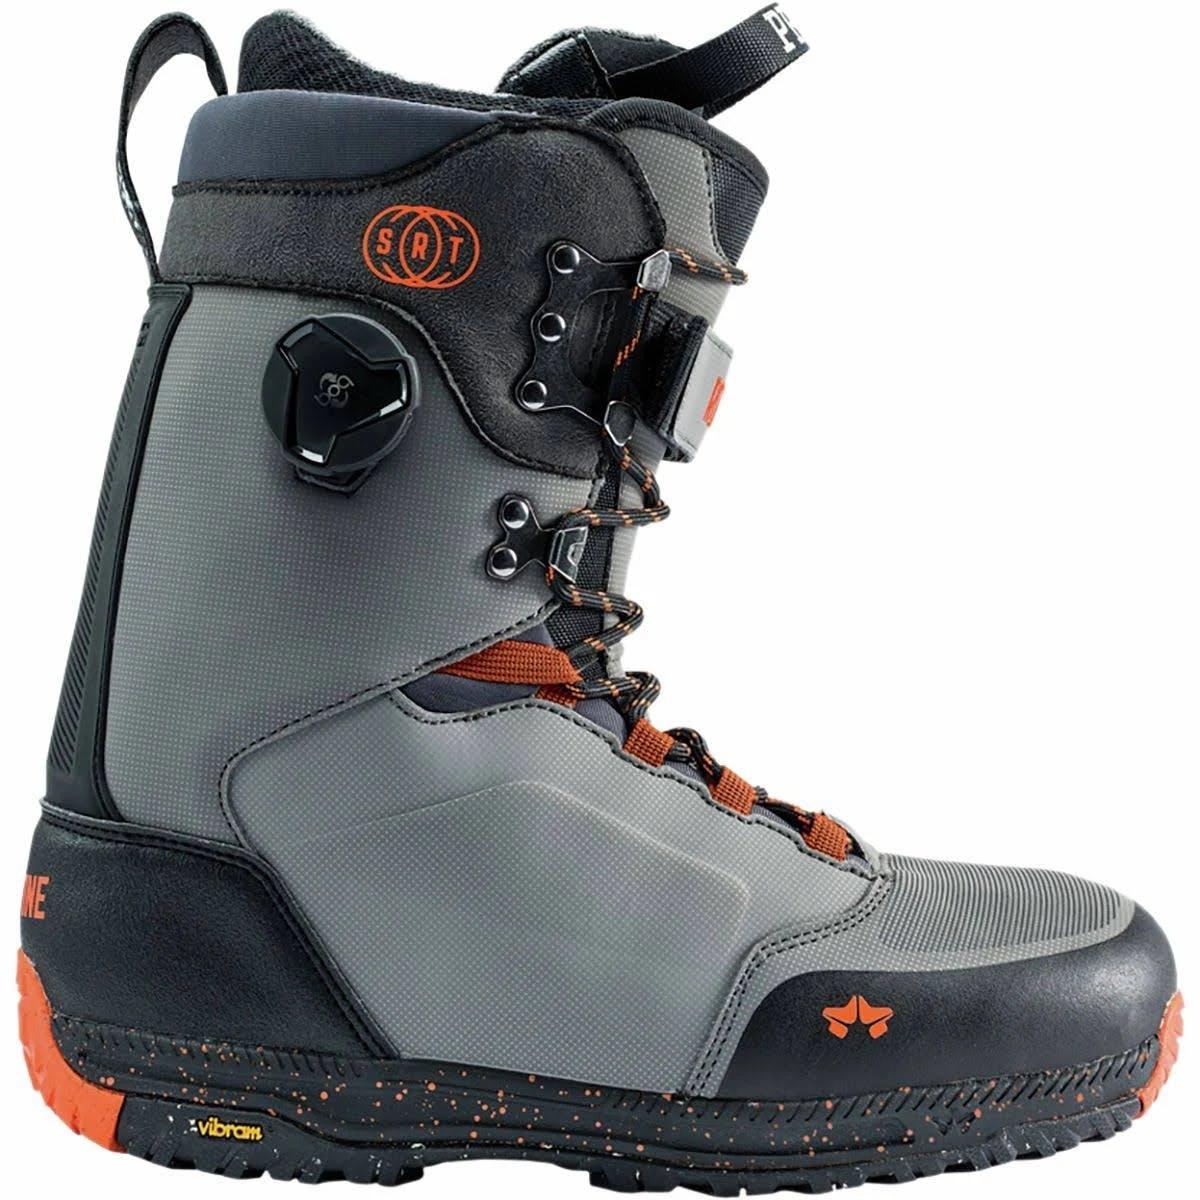 Rome Libertine Srt Snowboard Boots Men's Slate/orange 10.0